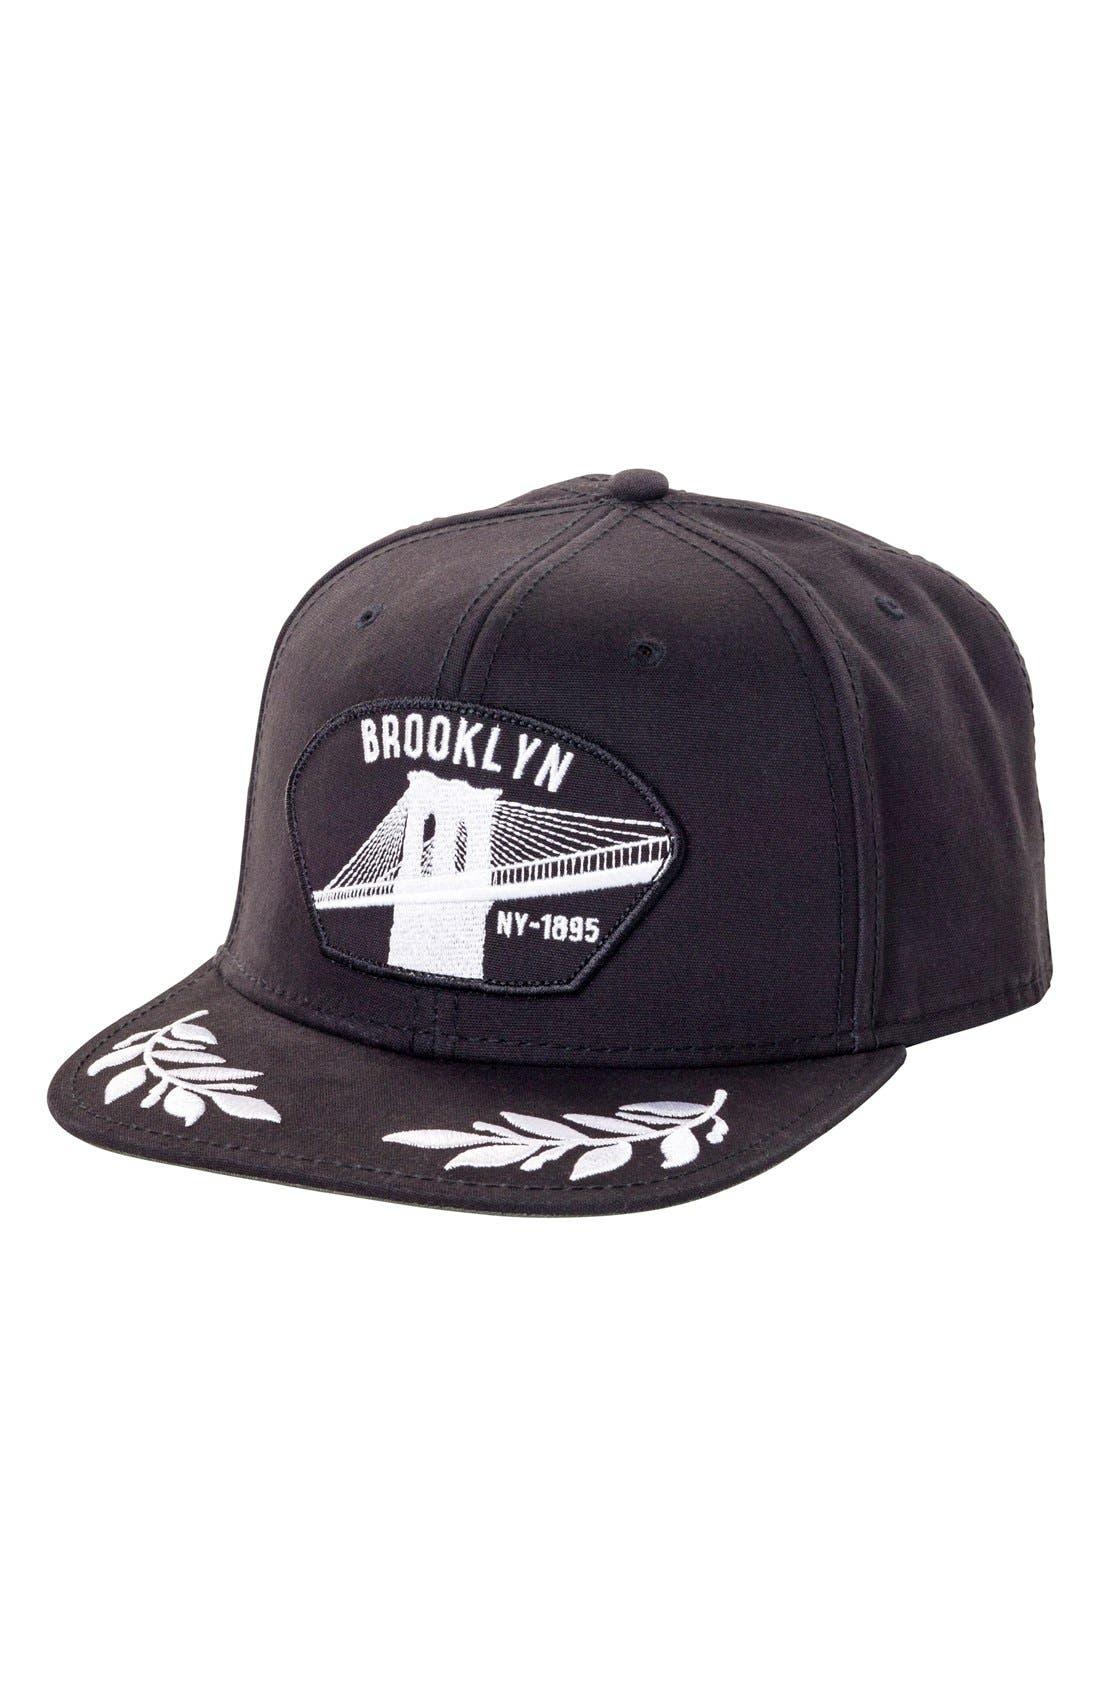 'Brooklyn NY' Baseball Cap,                             Main thumbnail 1, color,                             001